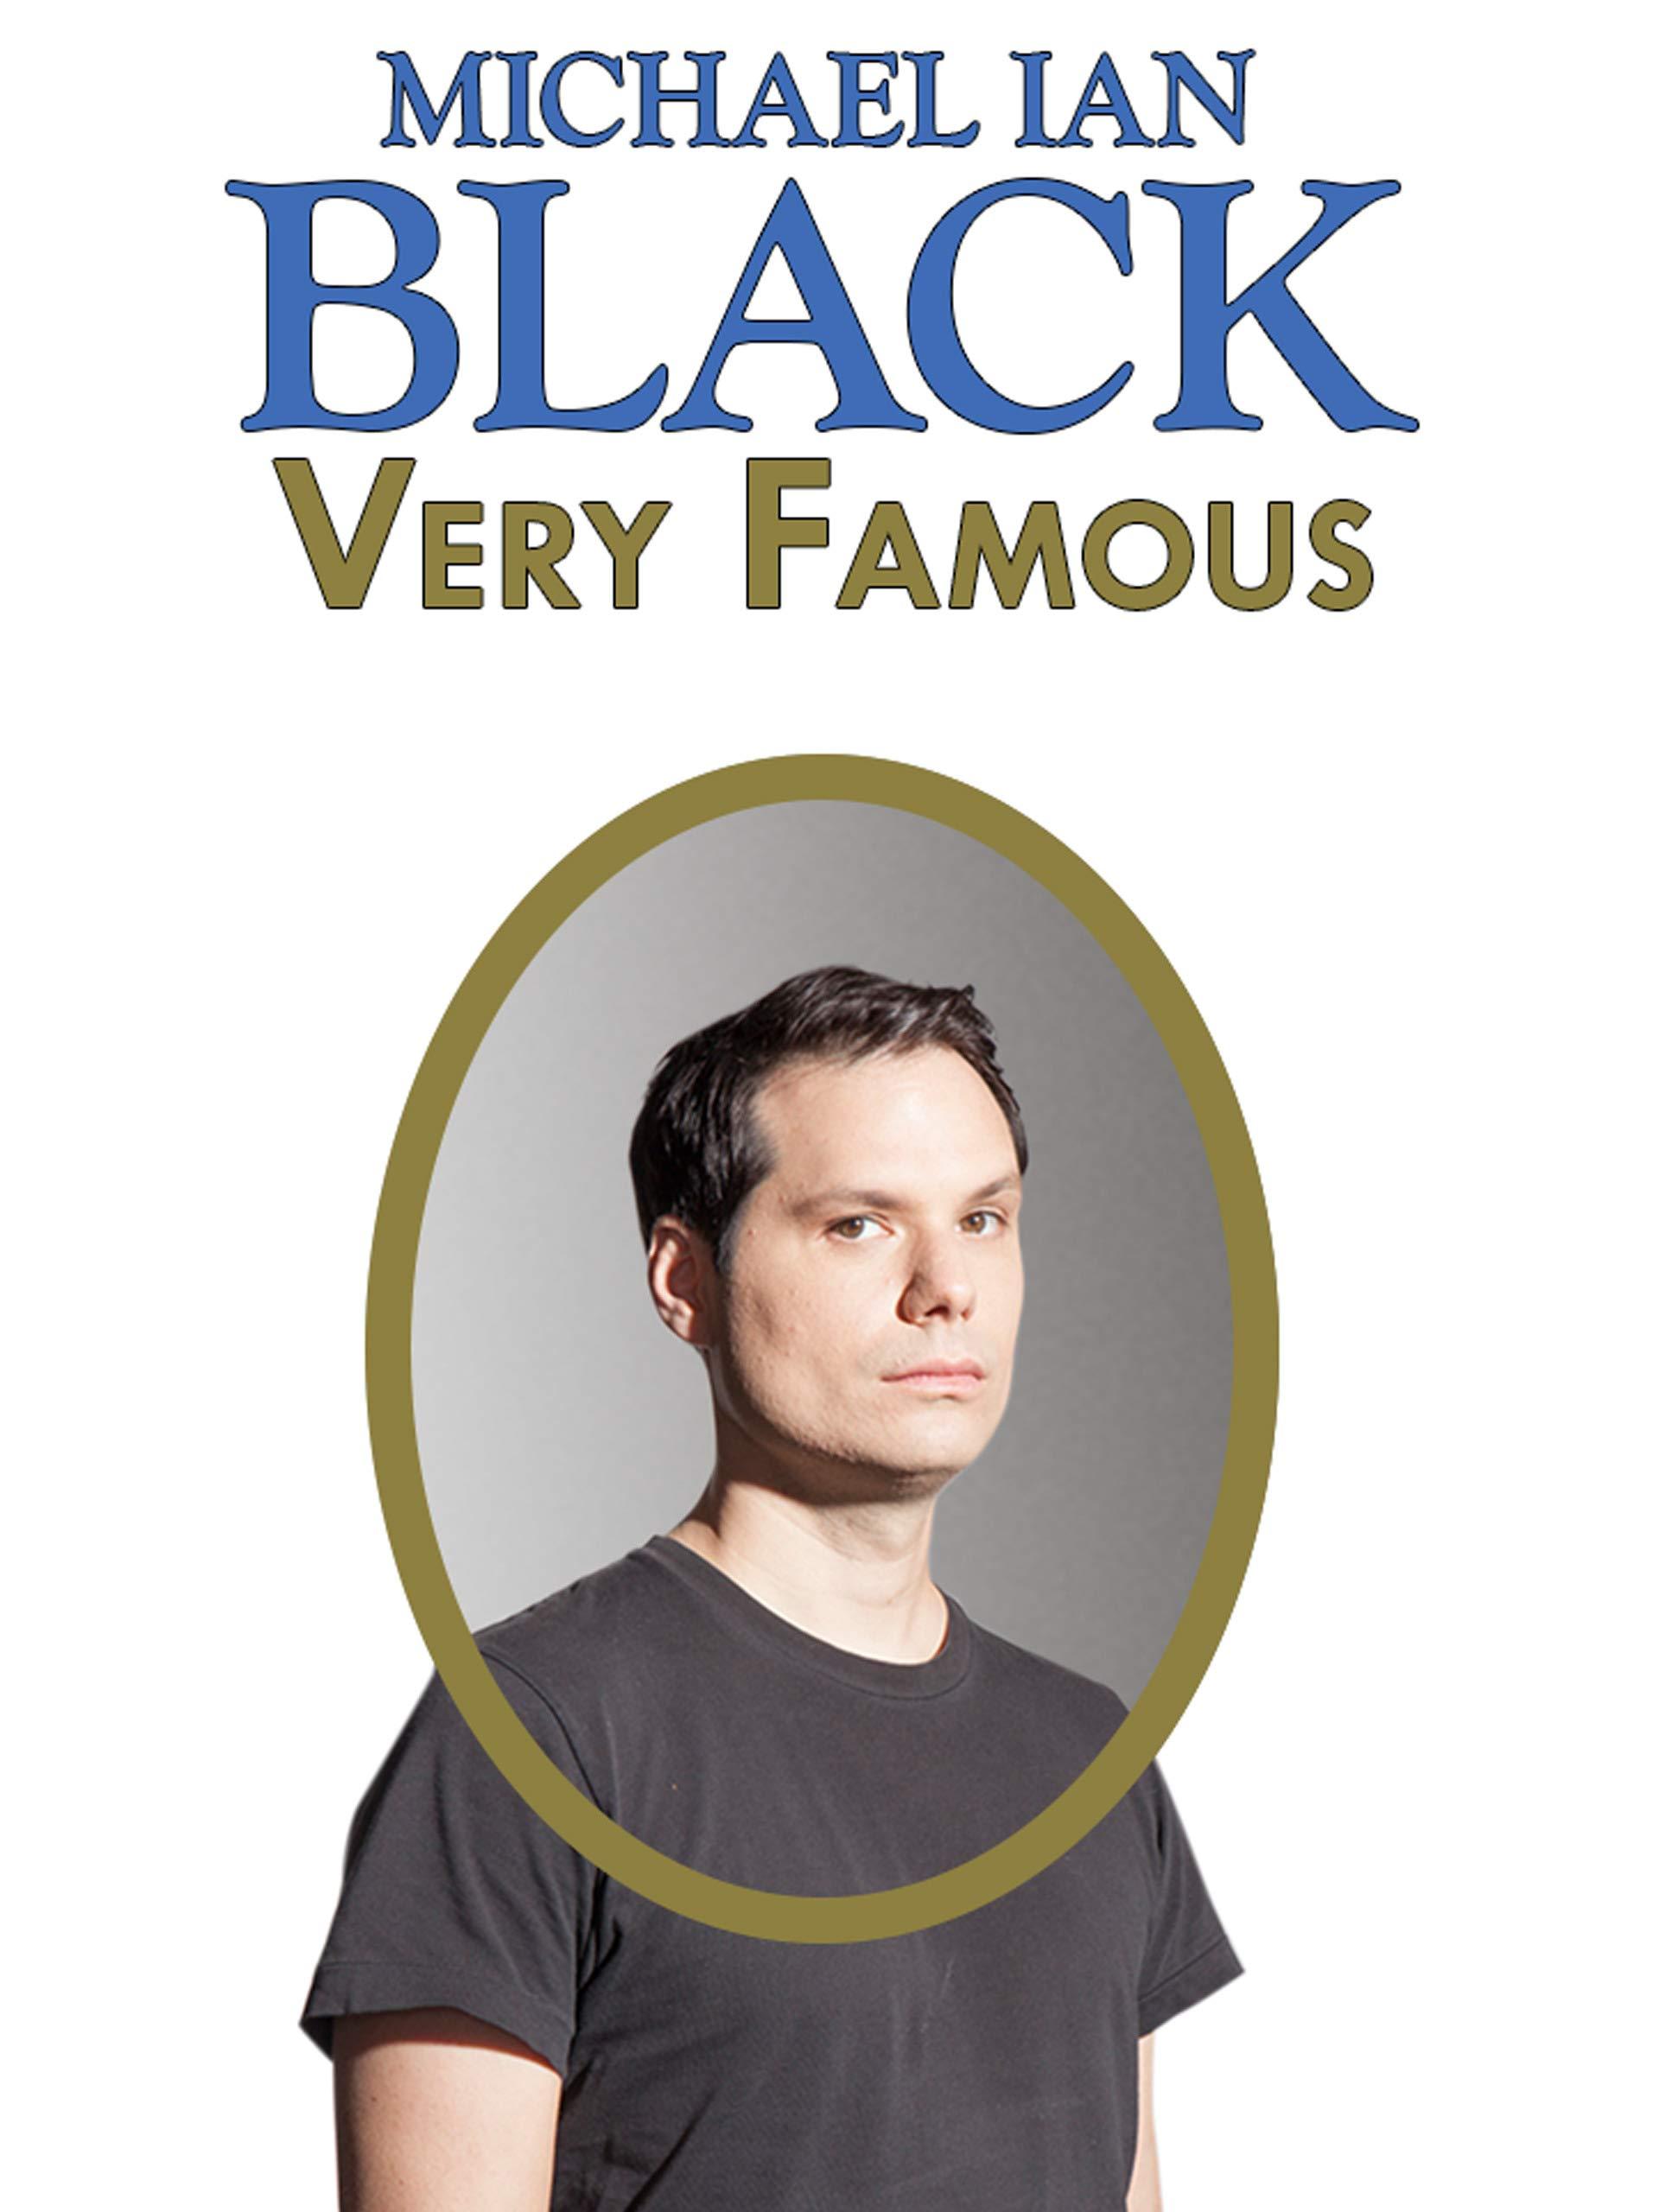 Michael Ian Black: Very Famous on Amazon Prime Video UK